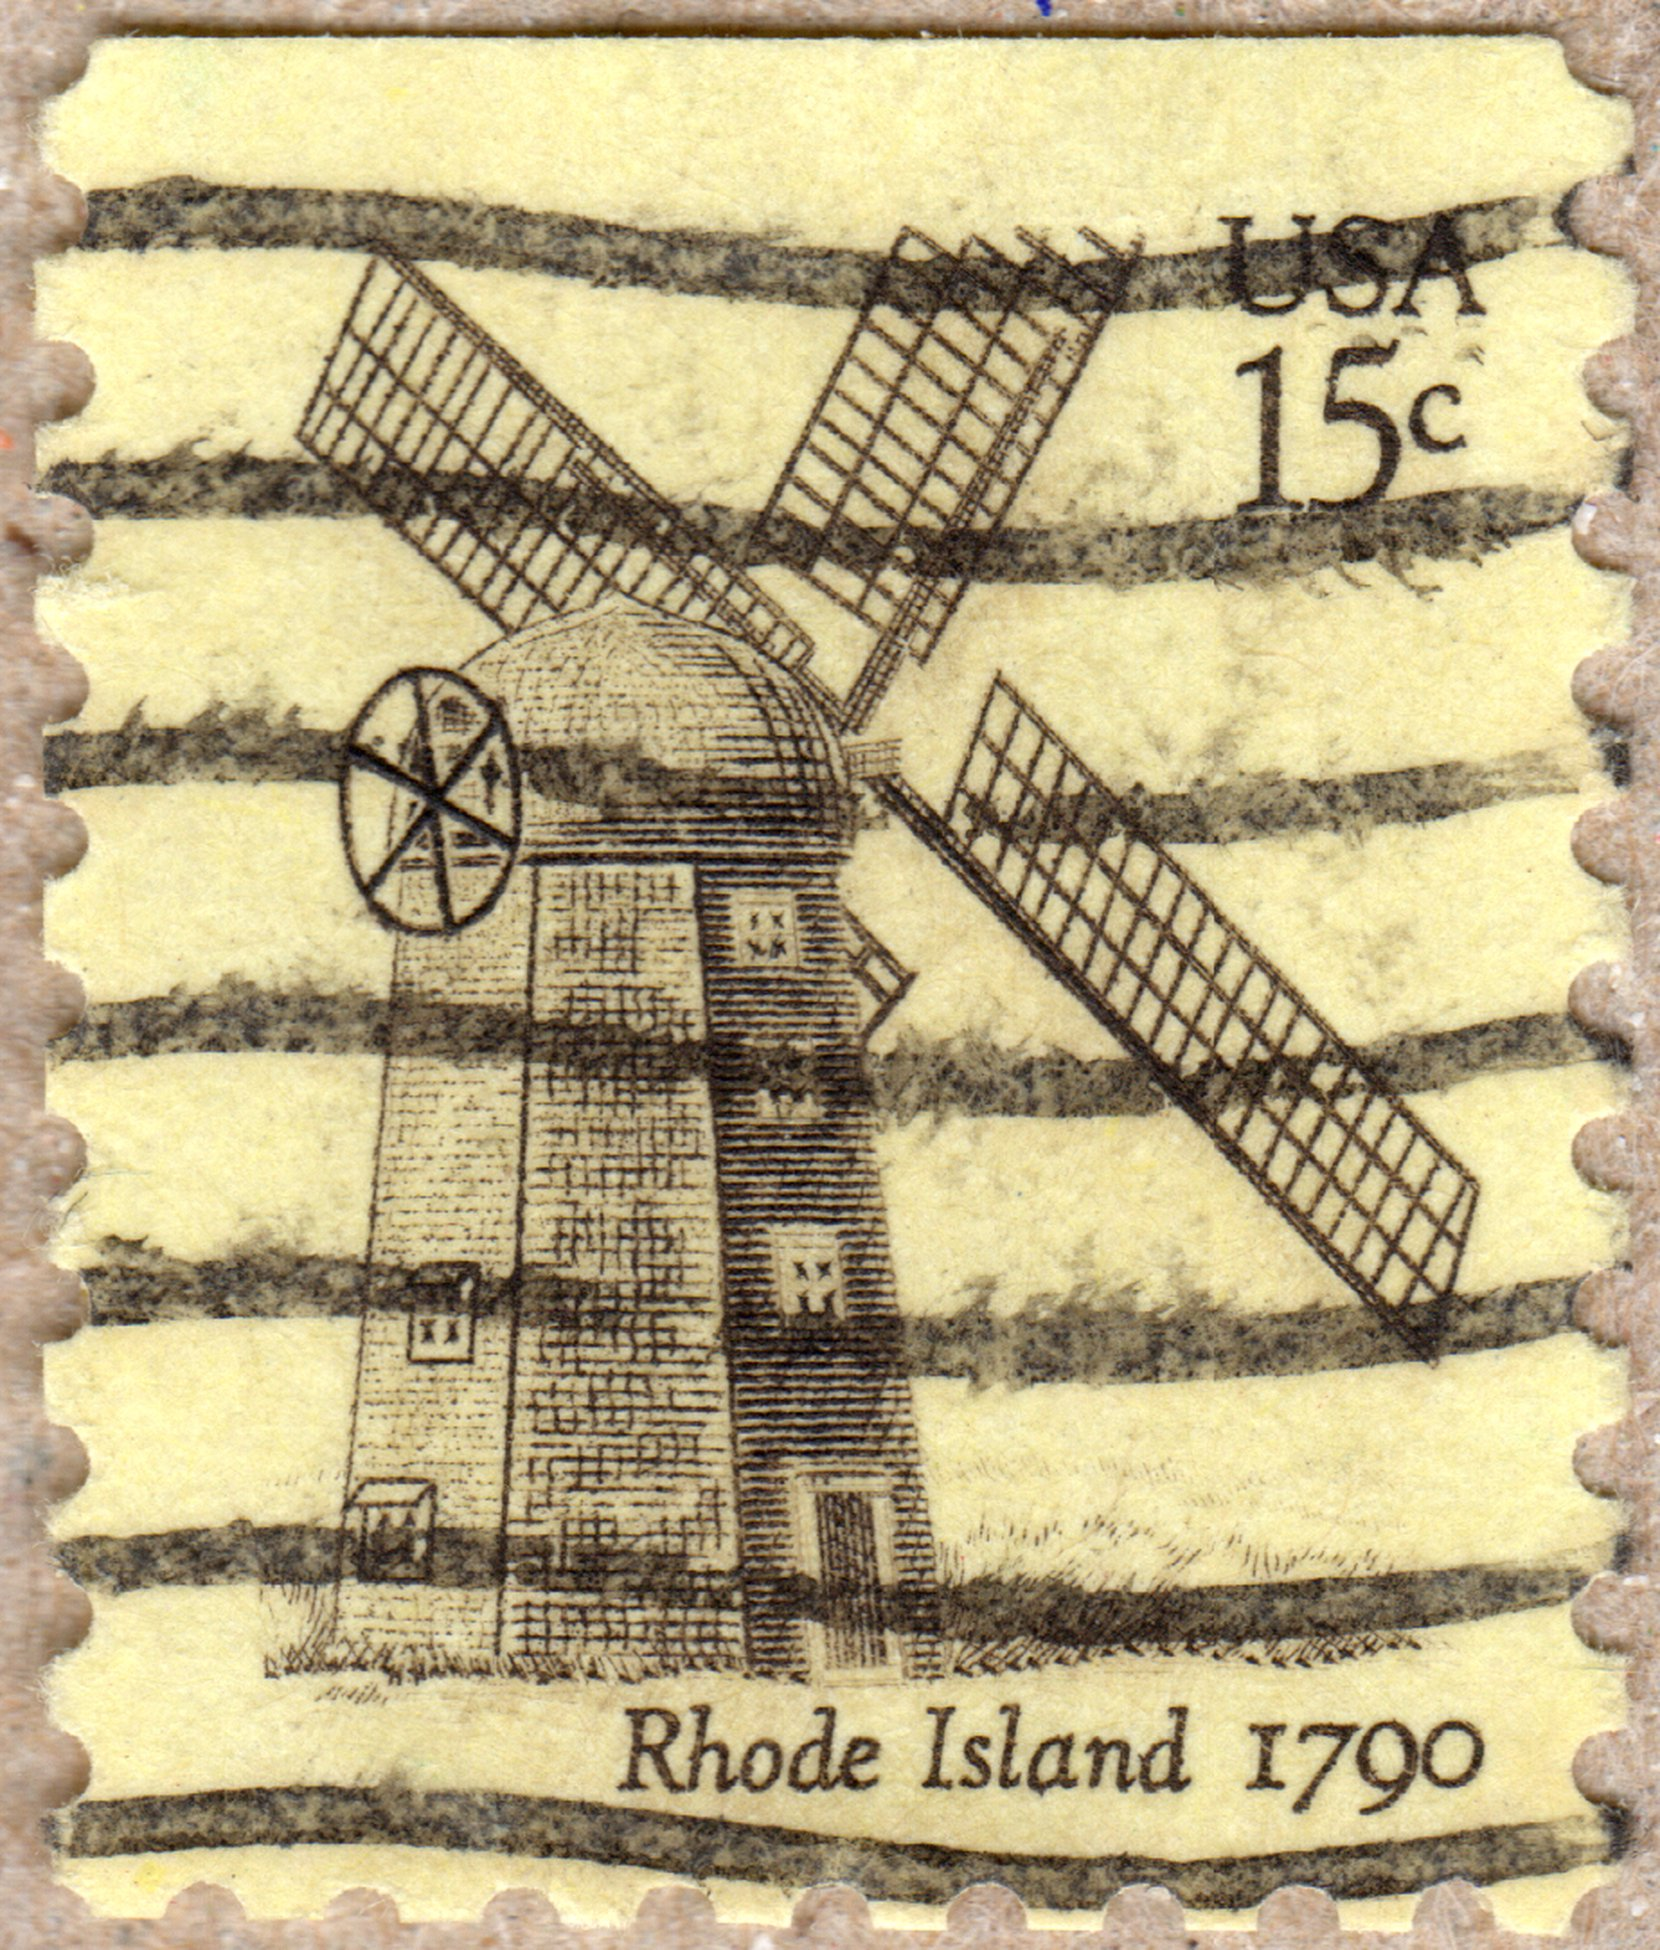 rhode island 1790 usa 15 ¢ u.s. postage stamp philately postage stamps